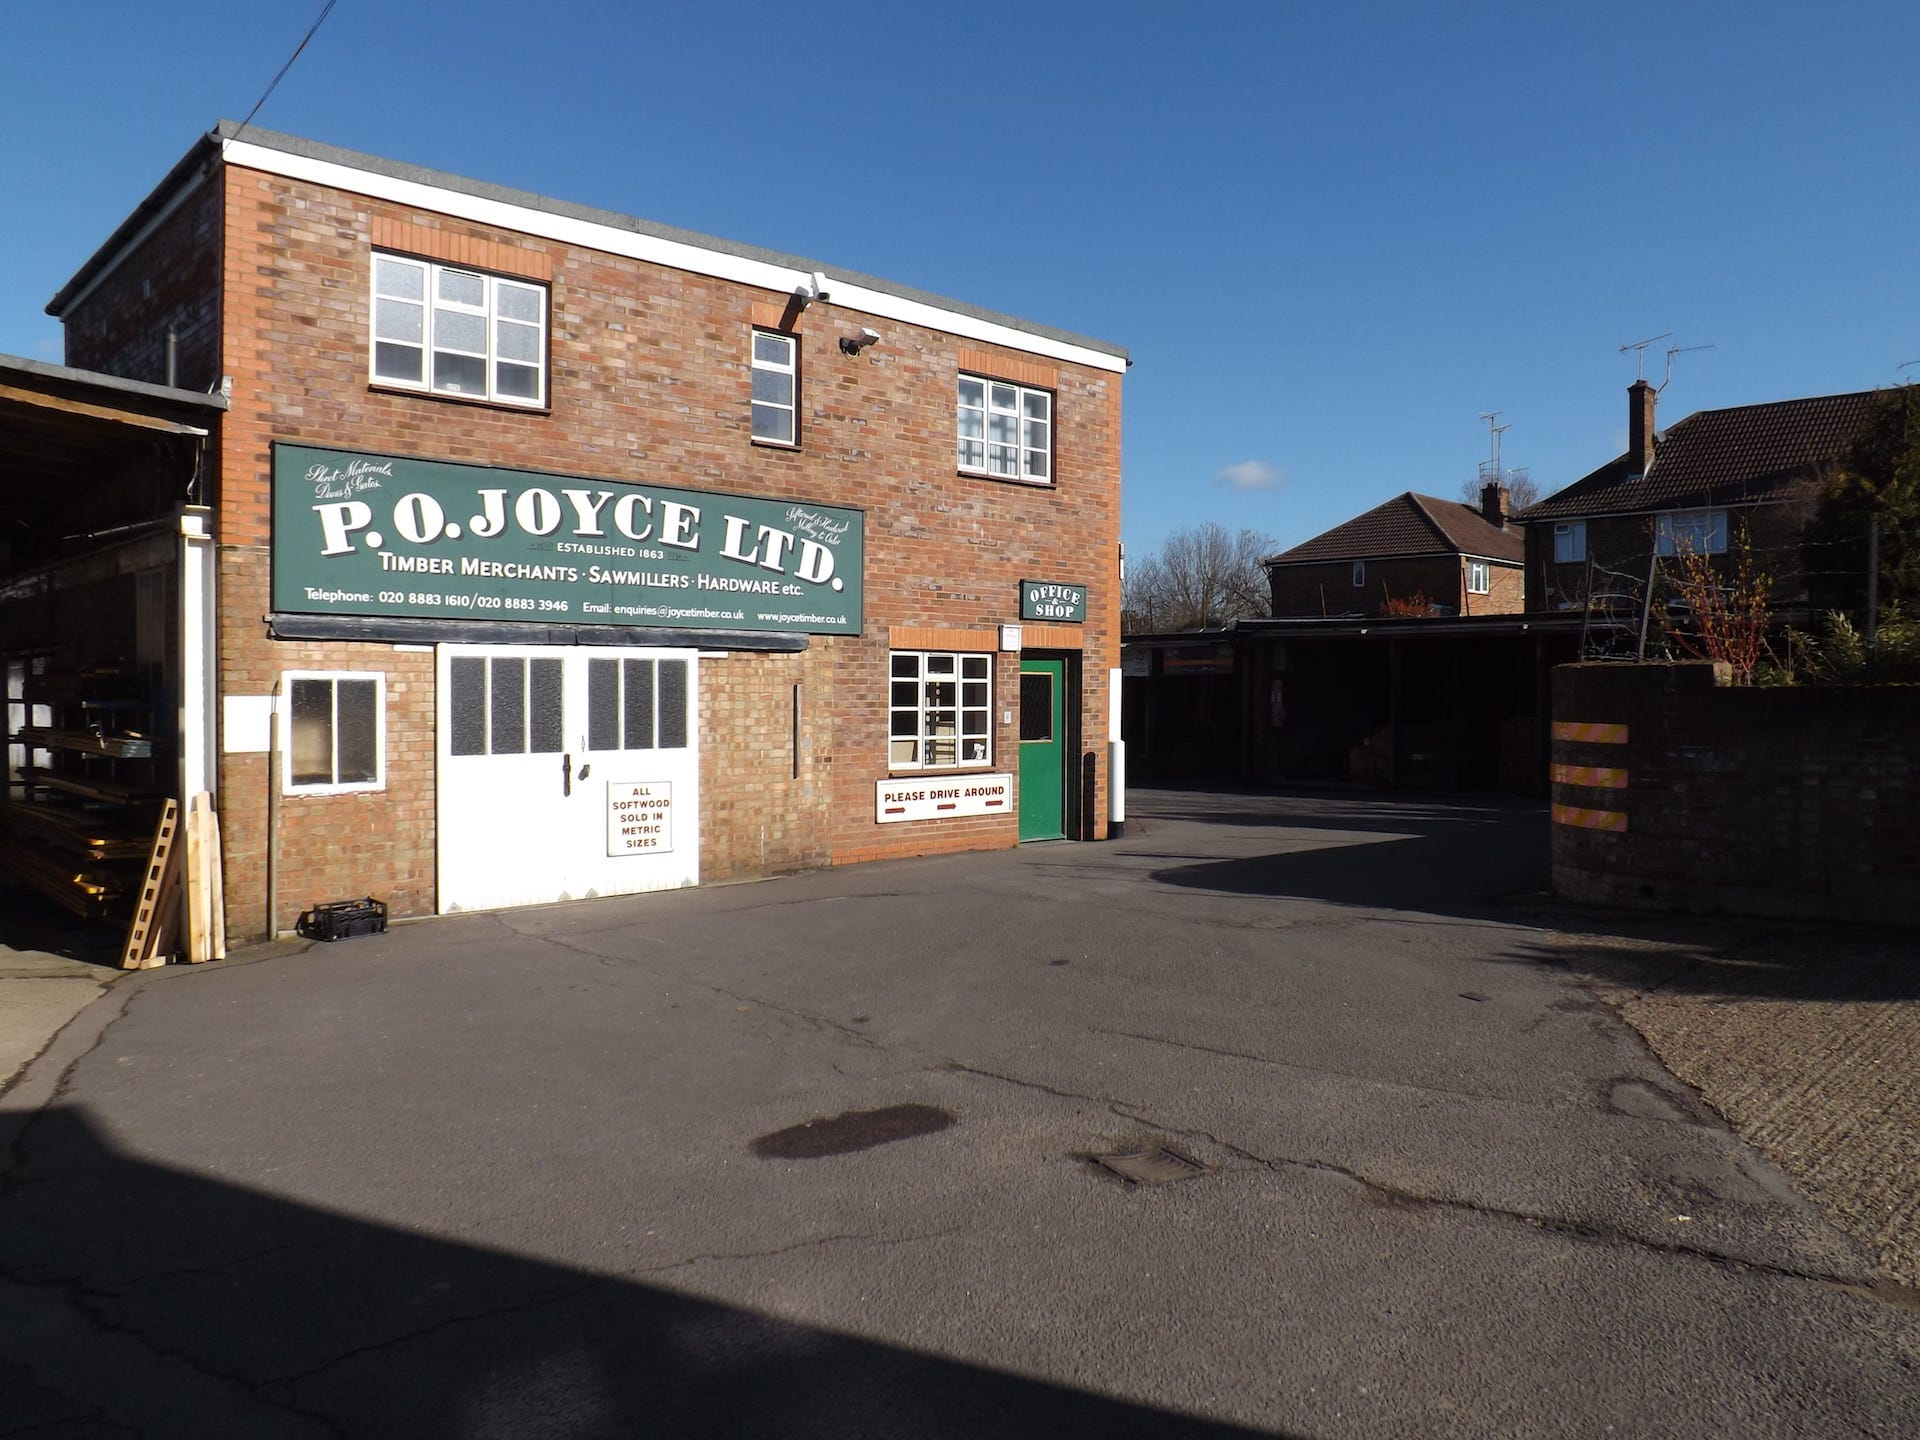 P.O. Joyce - Timber Merchants in London